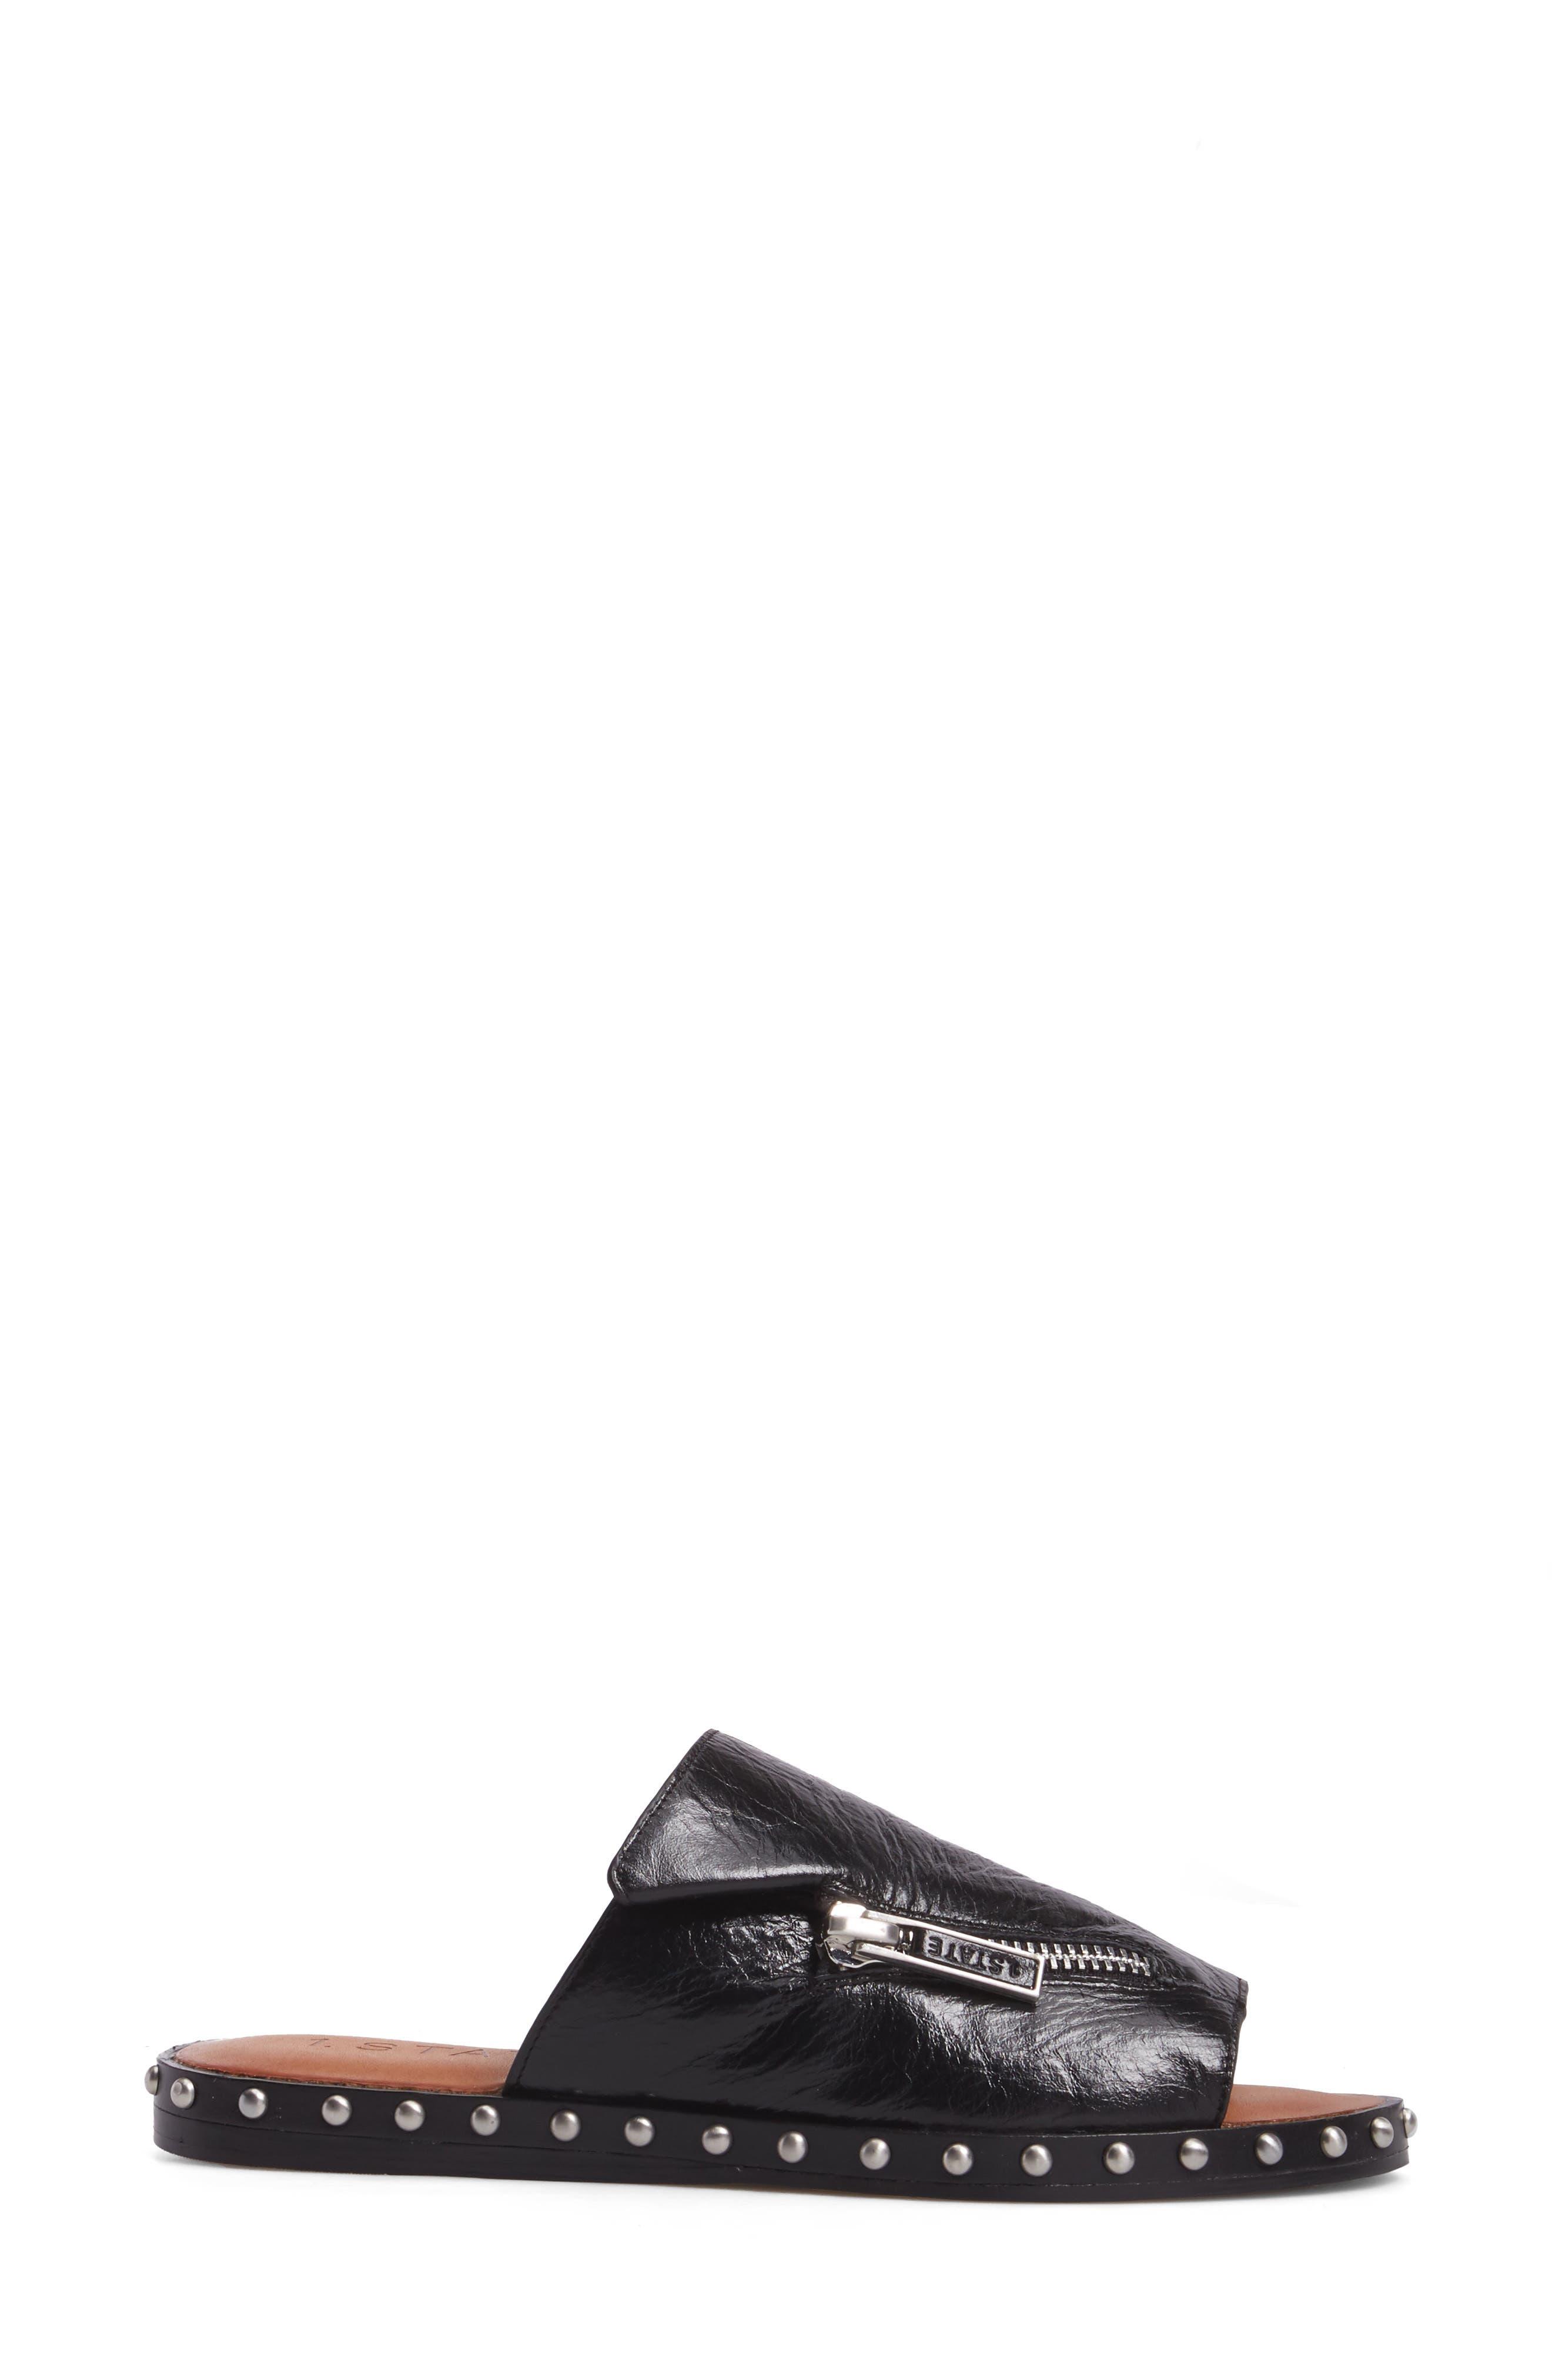 Cadwyn Slide Sandal,                             Alternate thumbnail 3, color,                             Black Leather